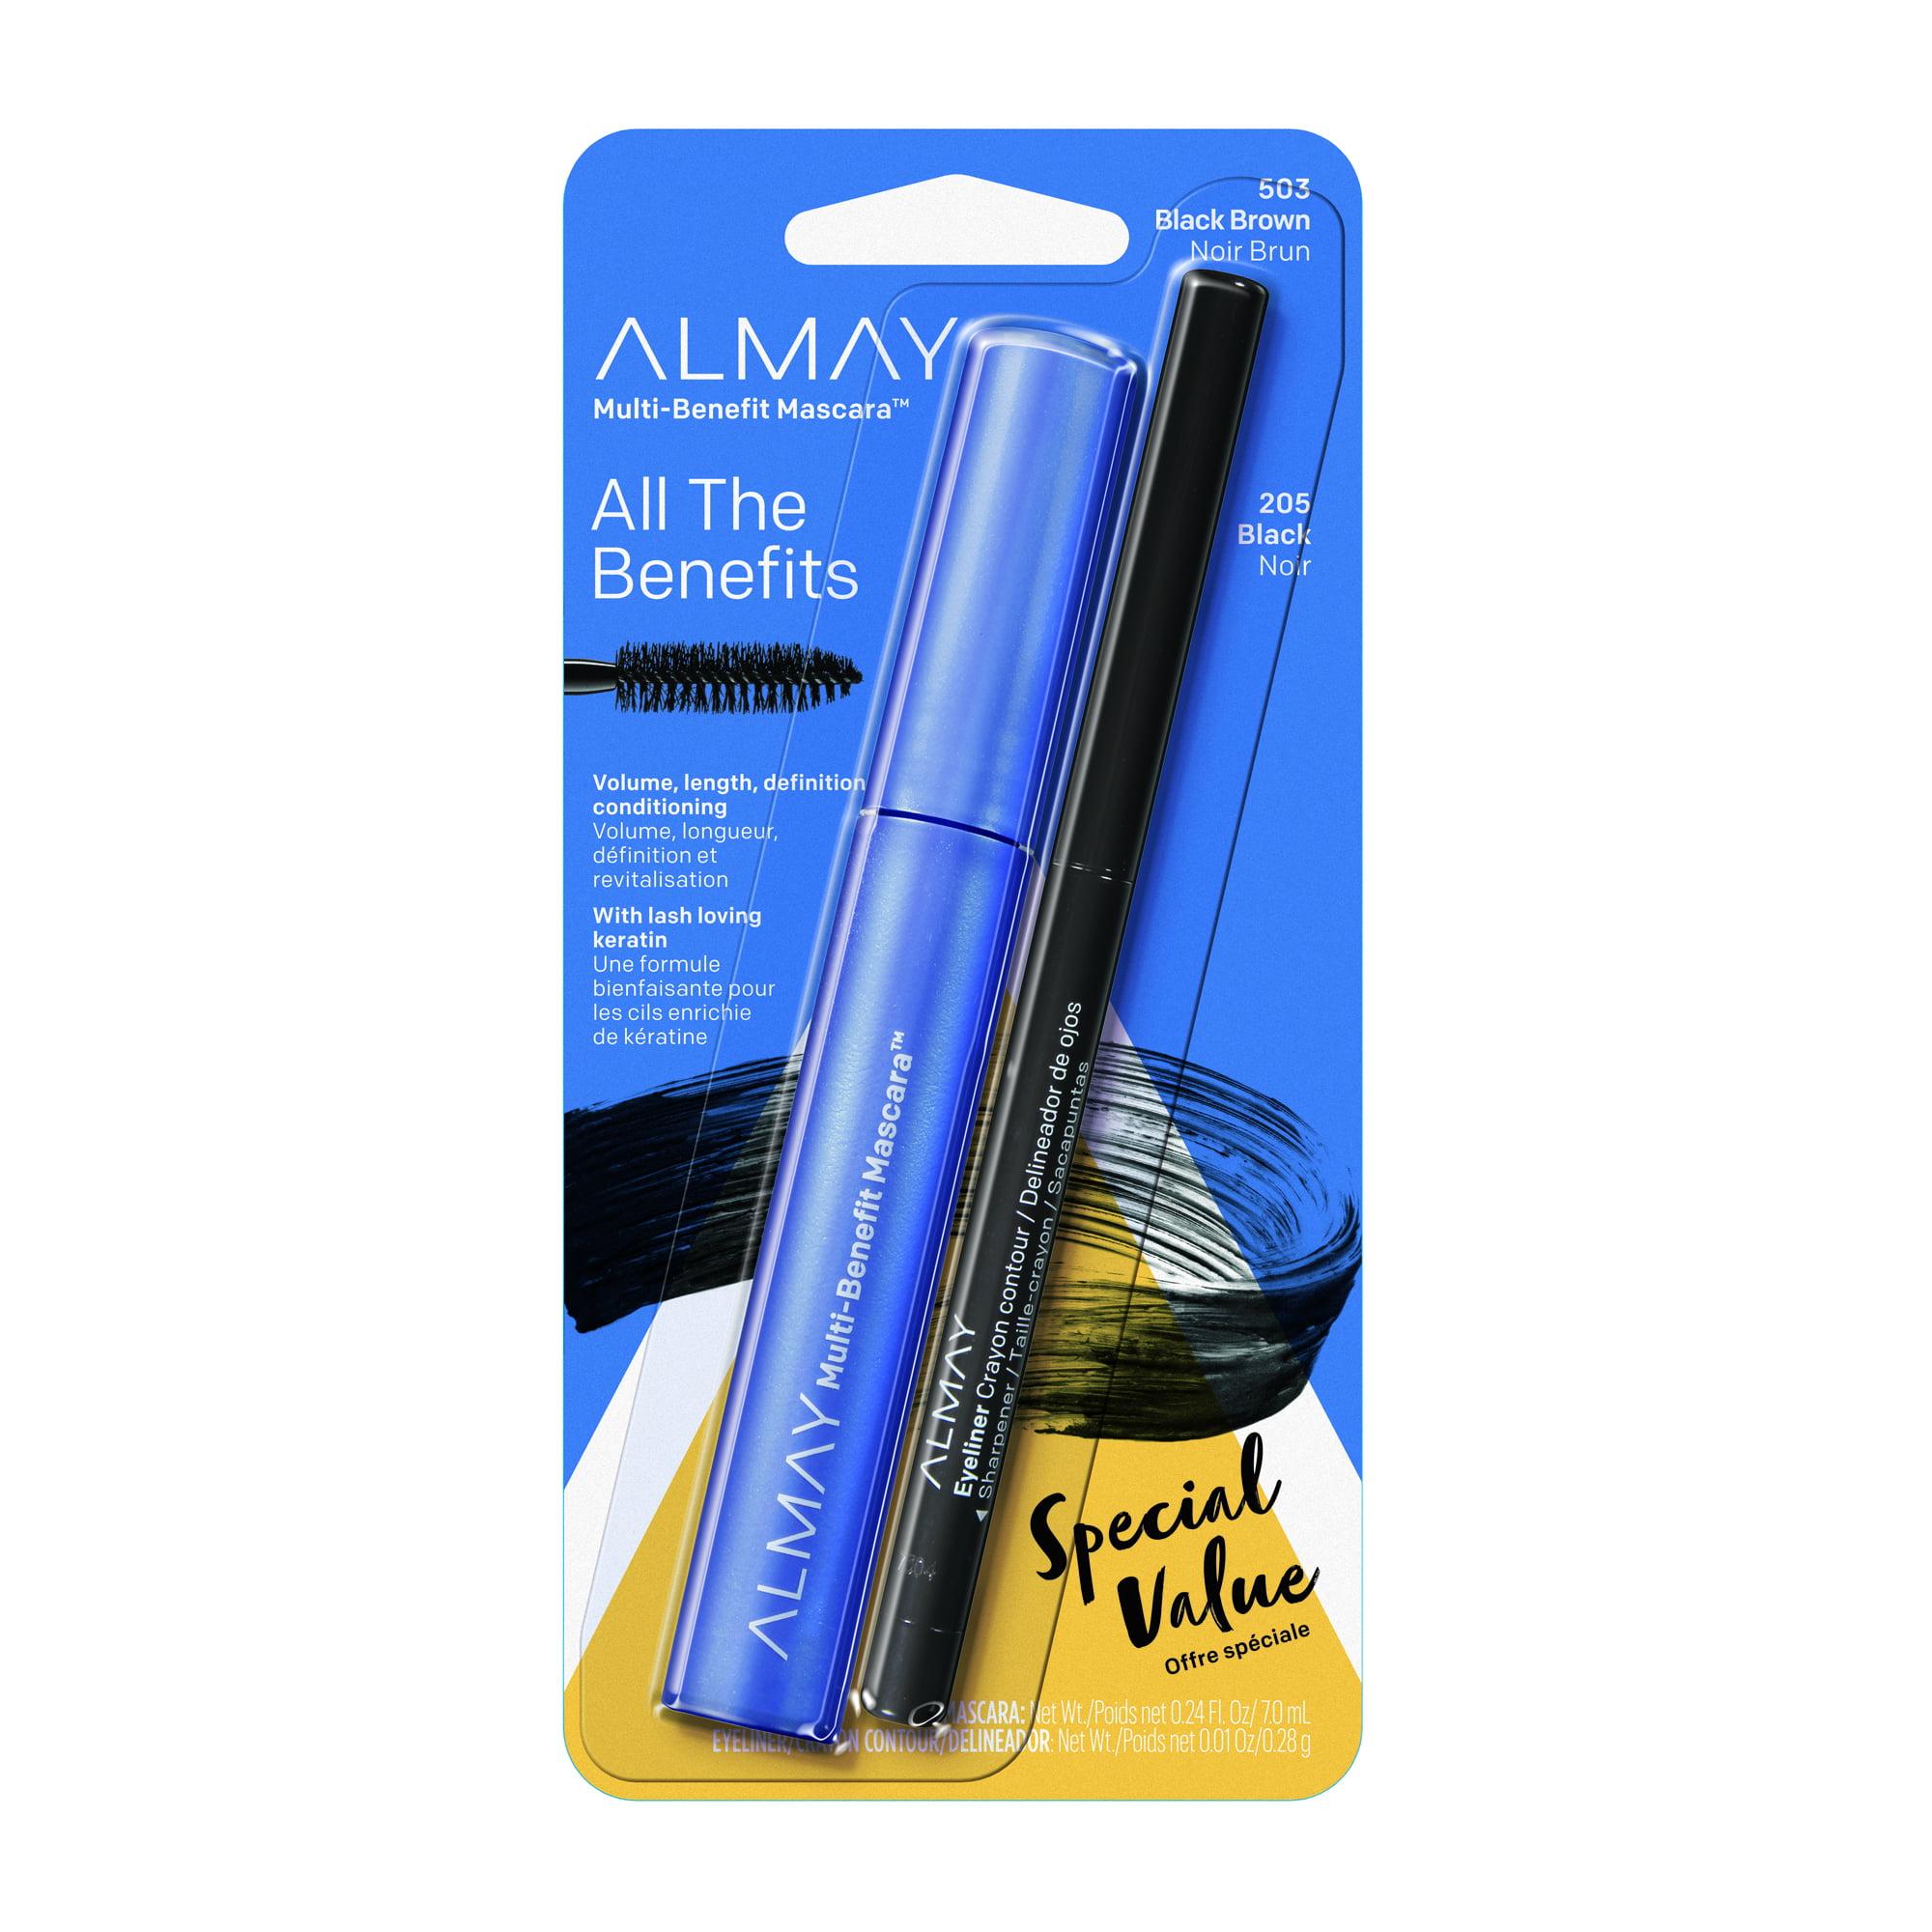 Almay One Coat Multi-Benefit Mascara with Eye Liner, Black Brown